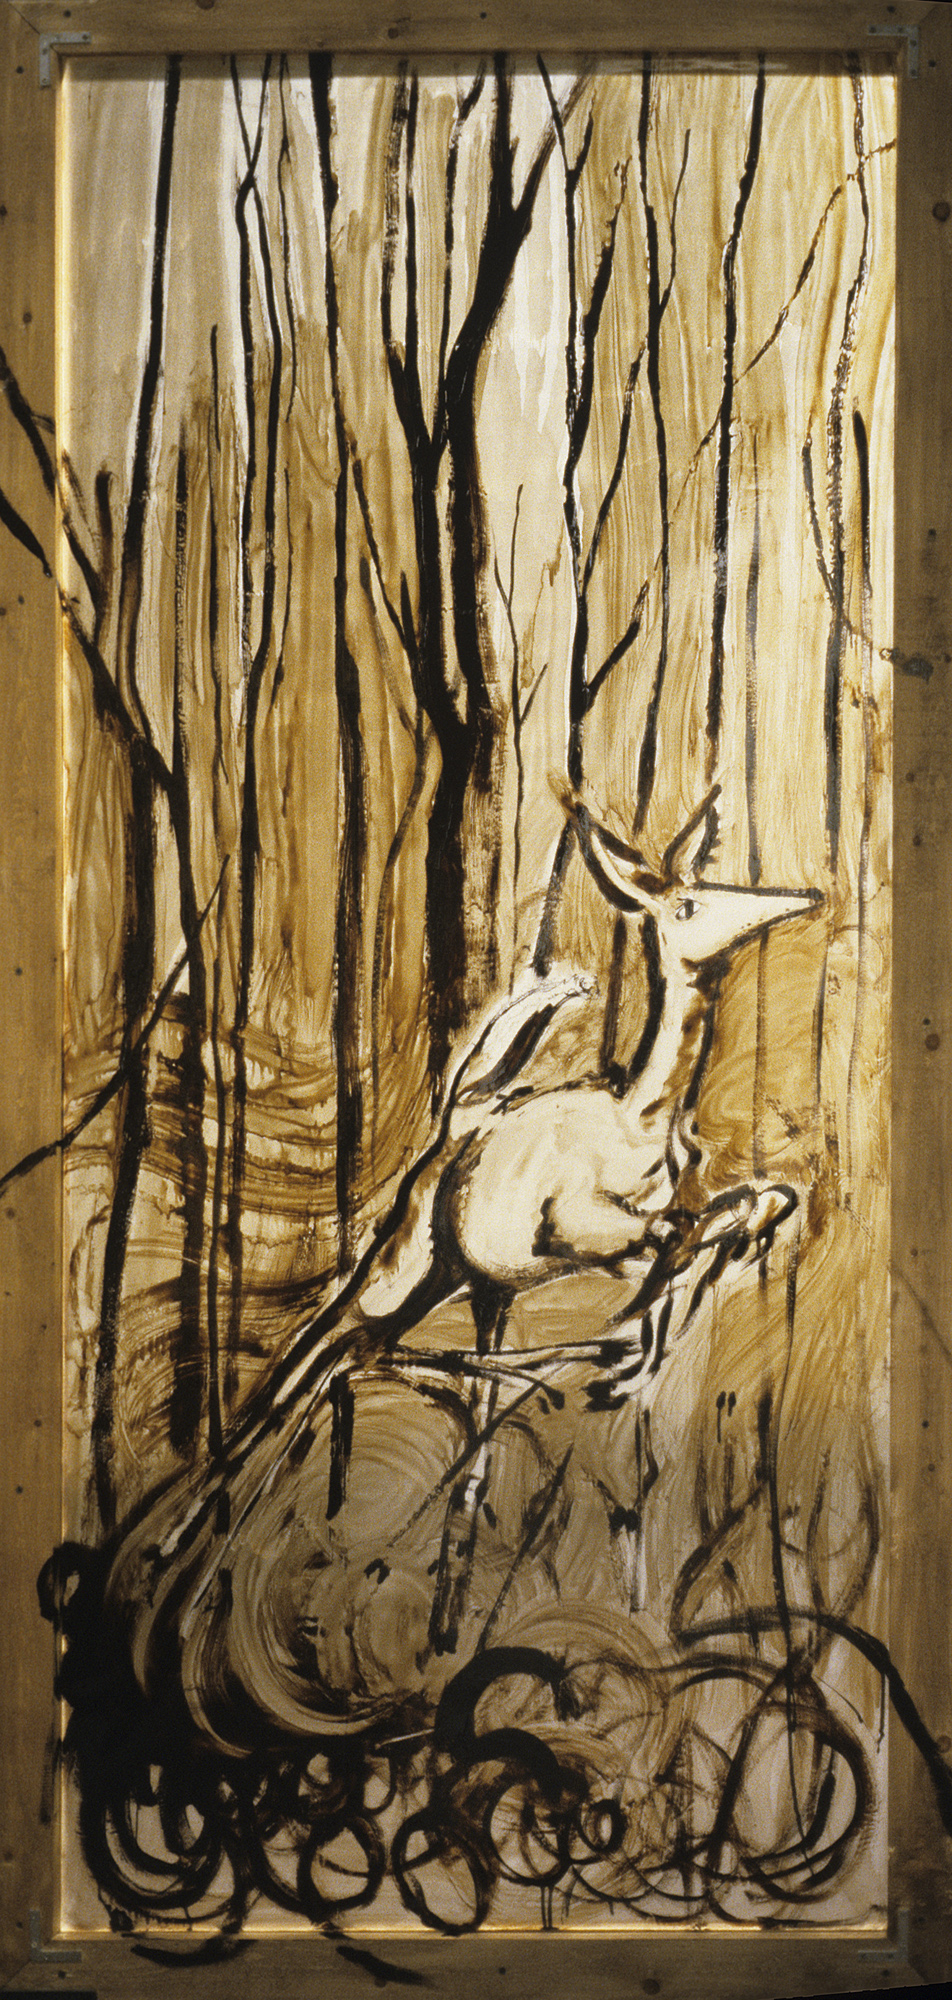 Deer: Translucent